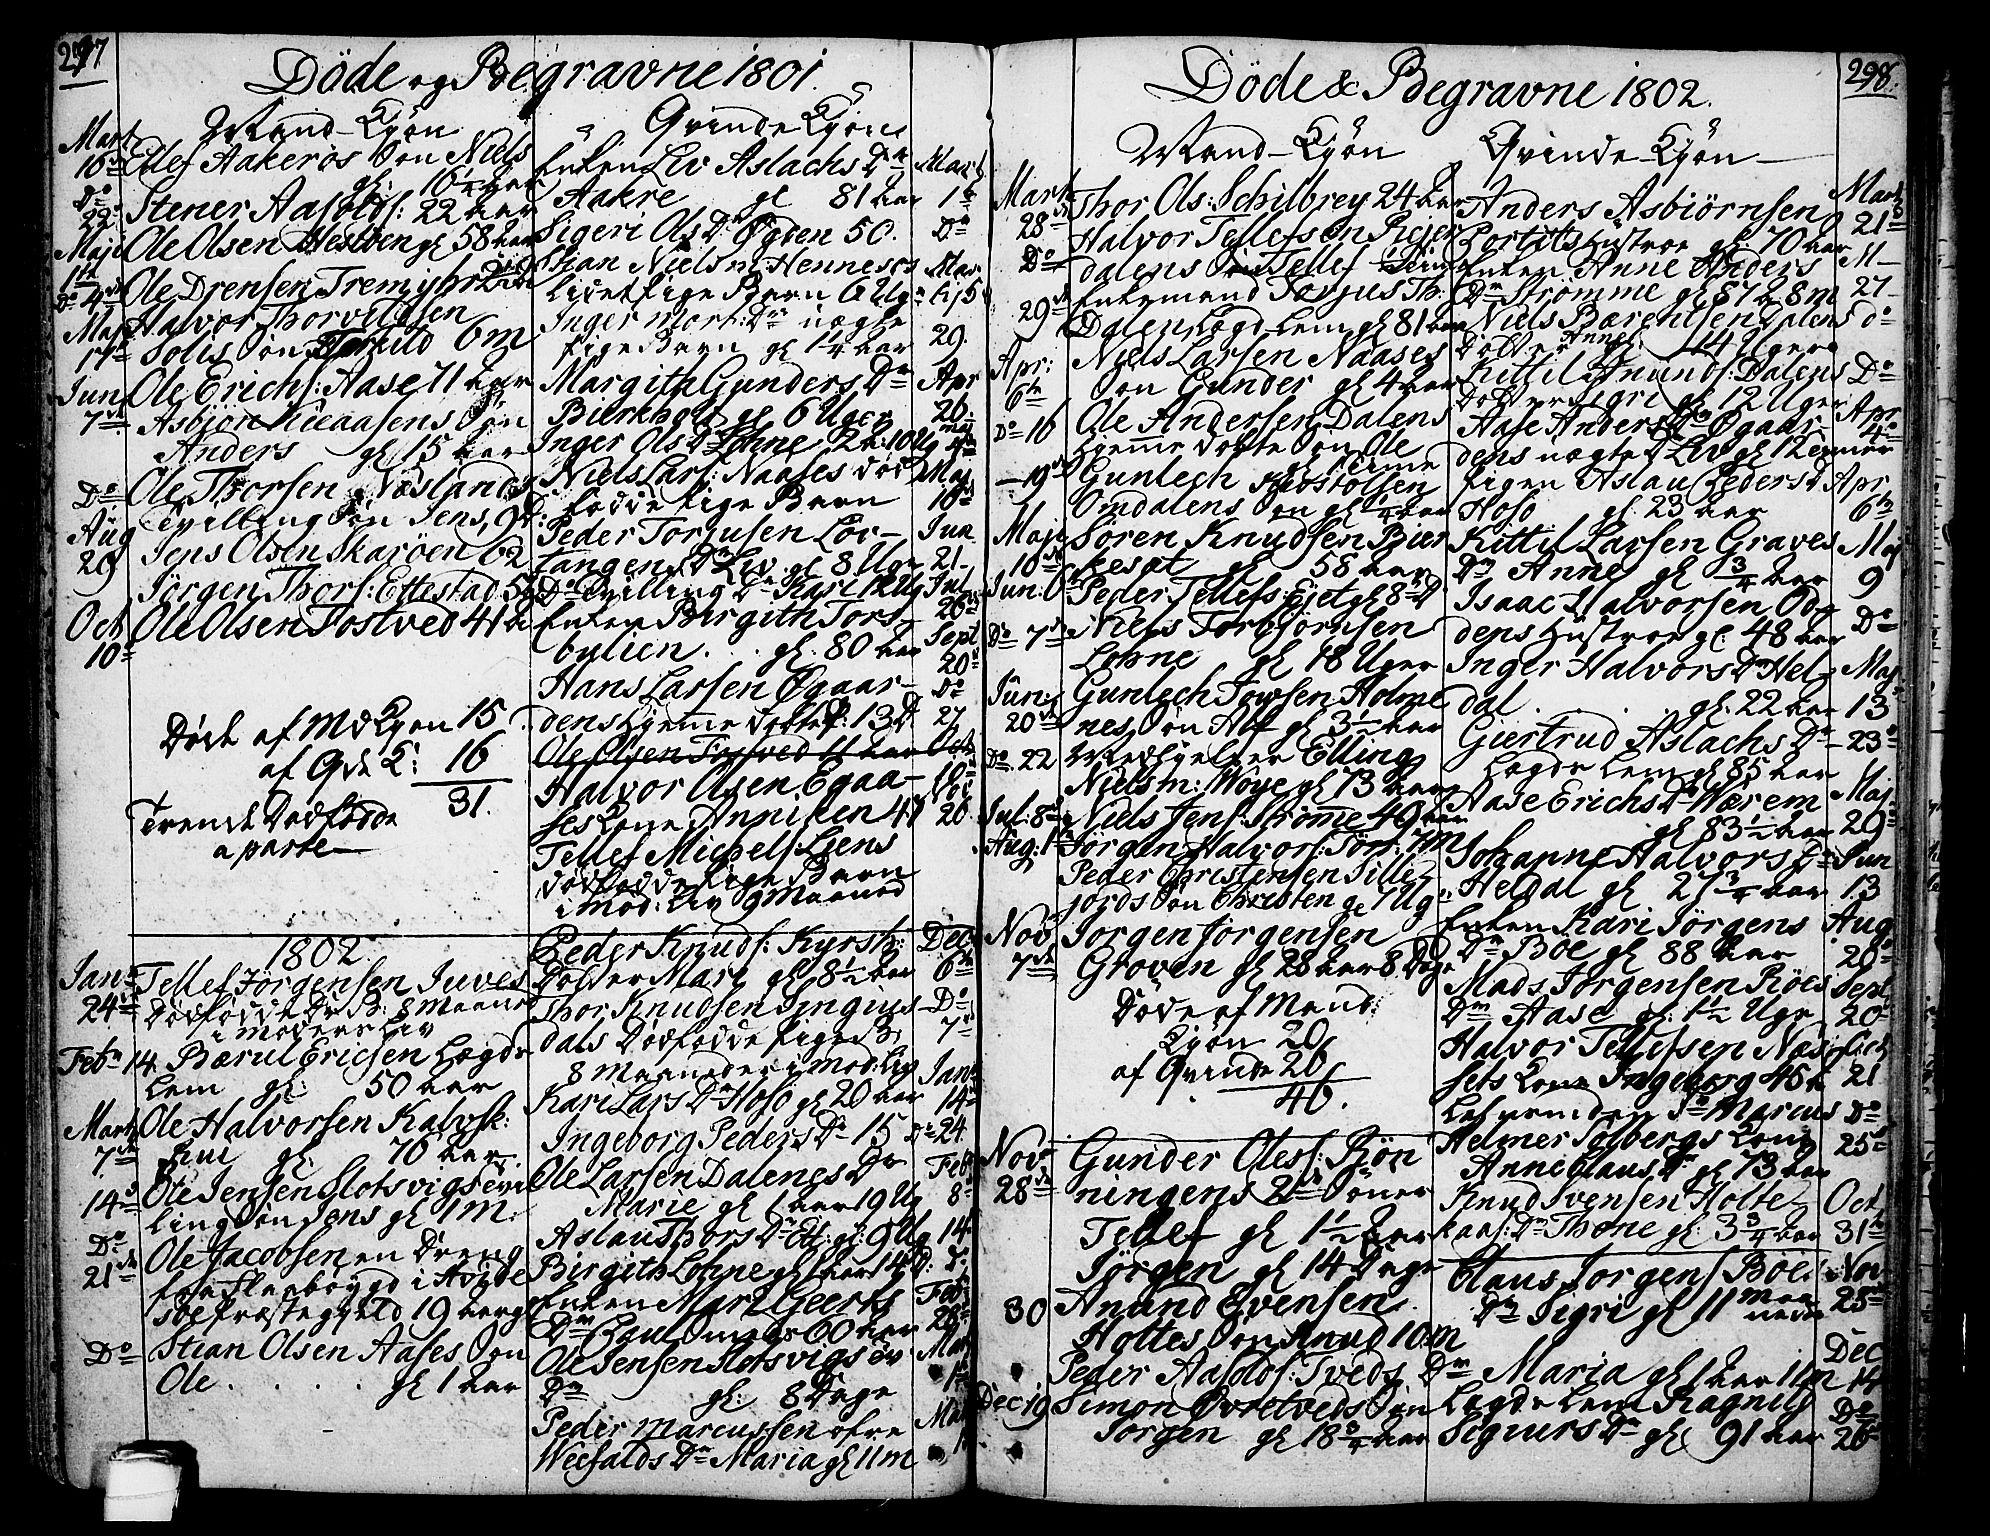 SAKO, Drangedal kirkebøker, F/Fa/L0003: Ministerialbok nr. 3, 1768-1814, s. 297-298